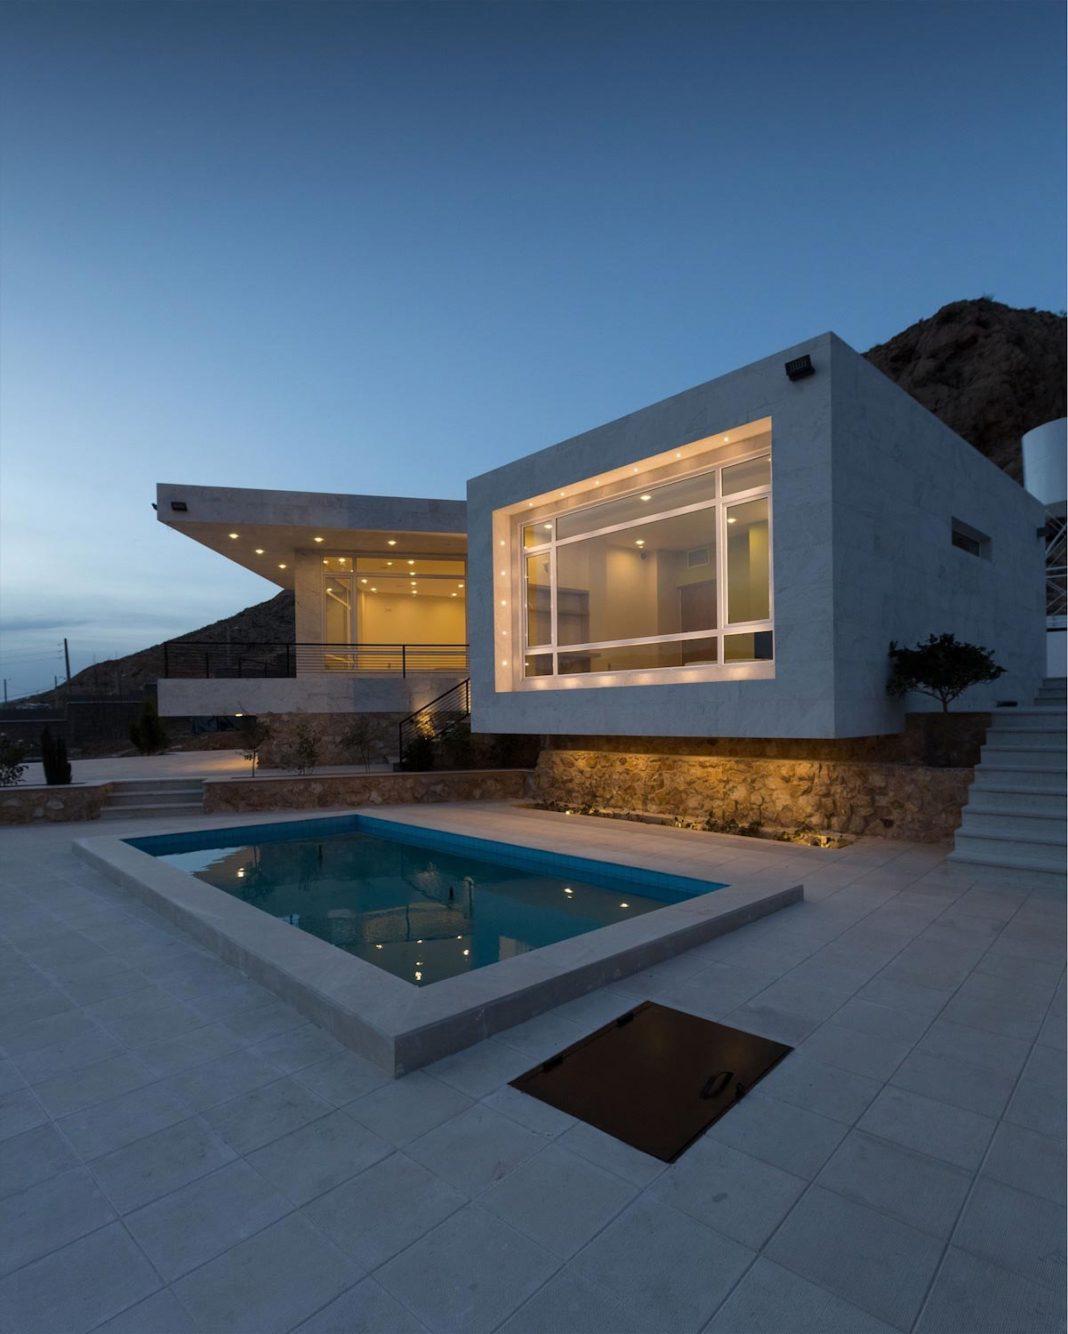 Weekend Villa located on the hillside of Sadra City